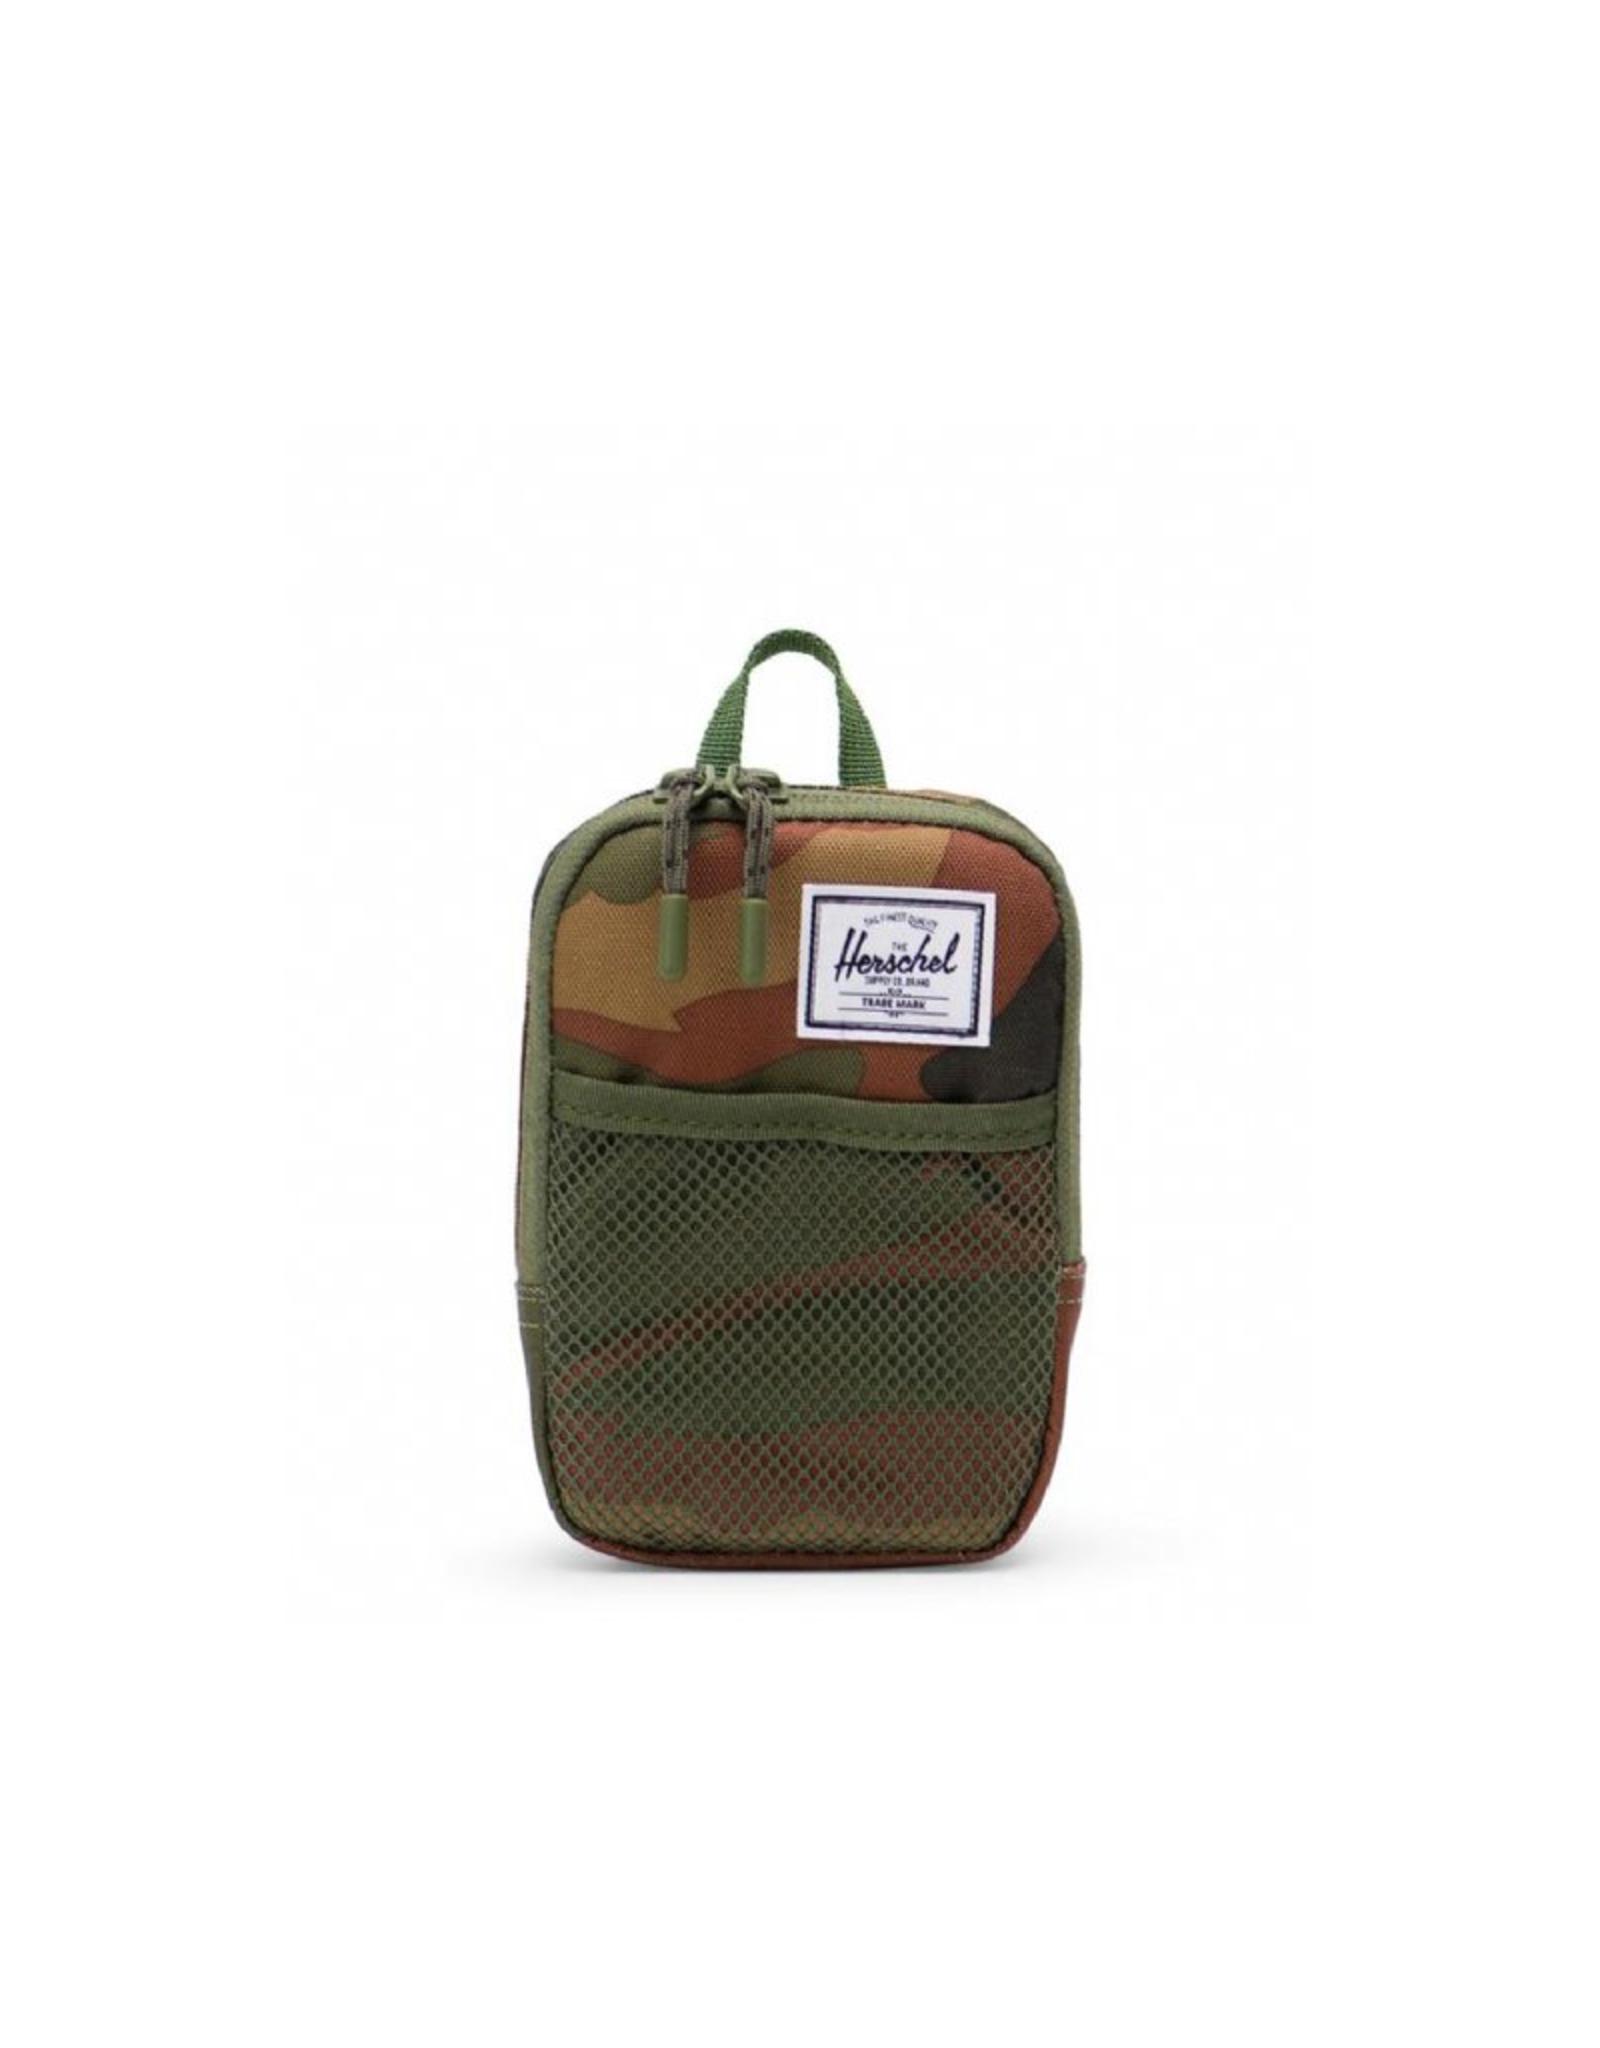 Herschel Sinclair Crossbody Bag